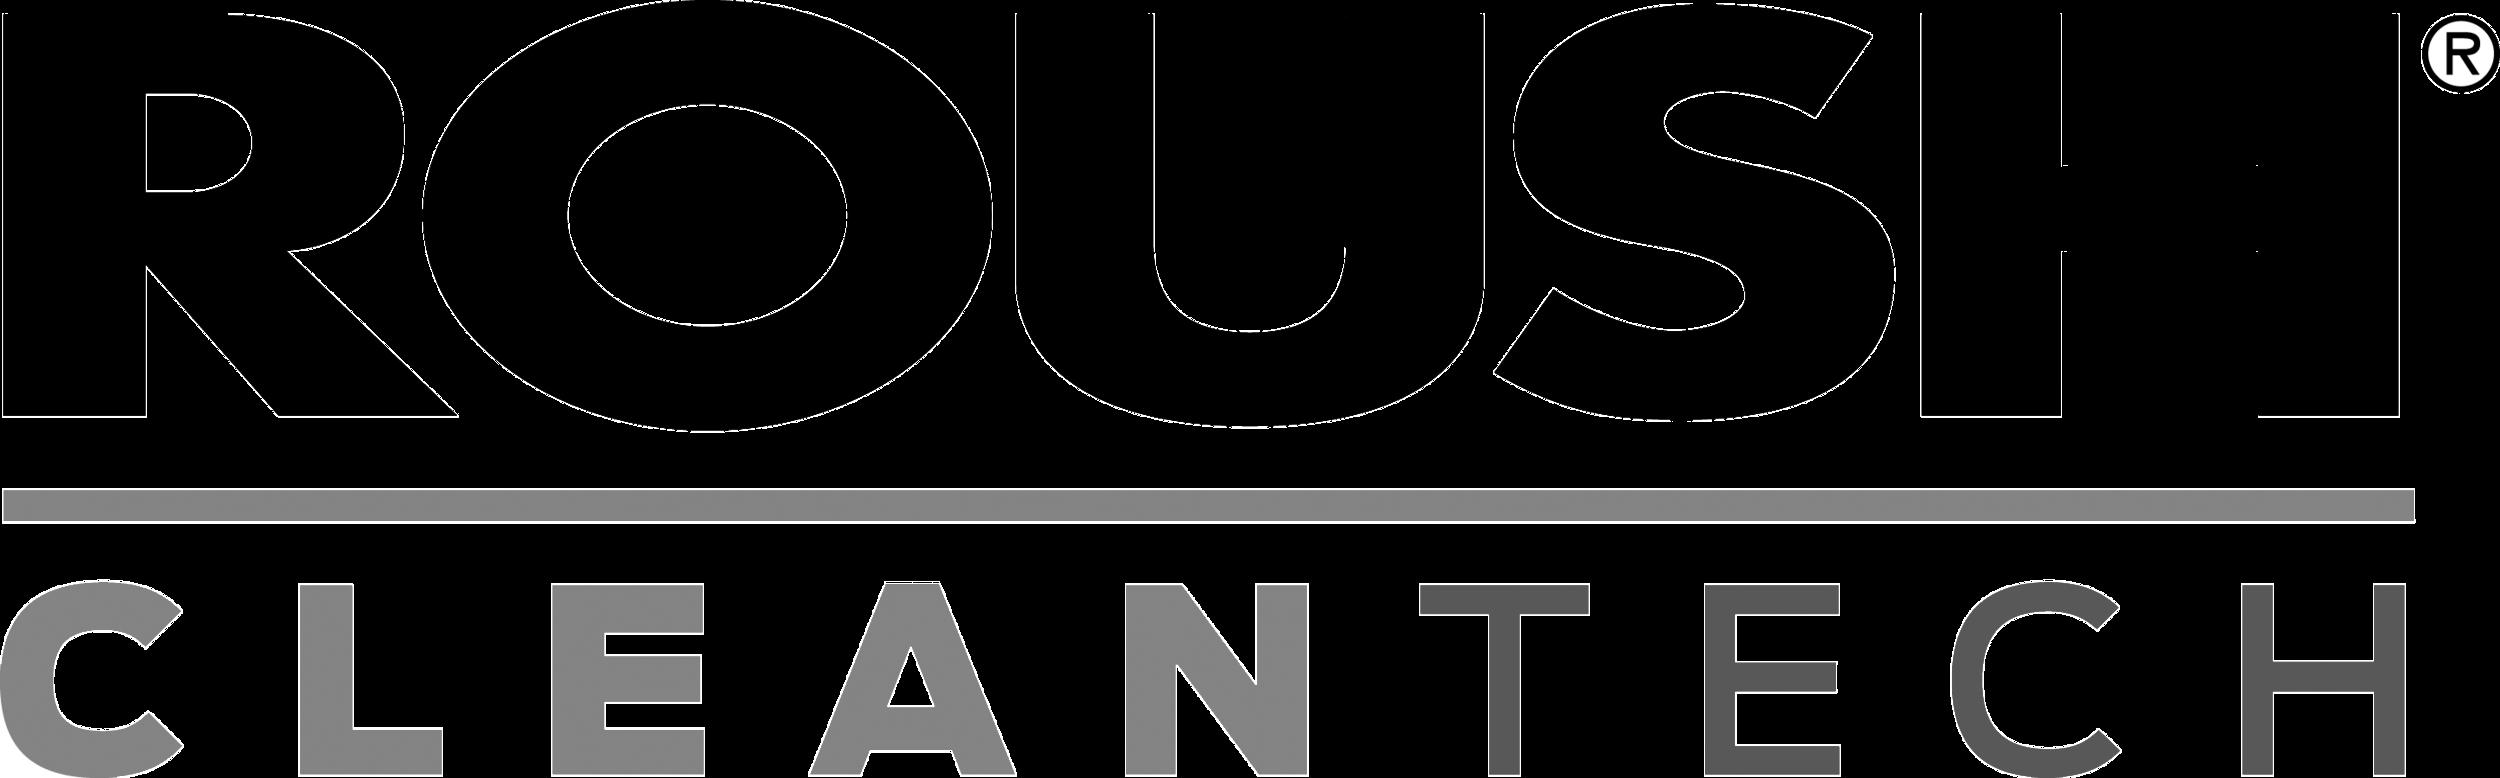 RoushCleanTech_logo BW.png